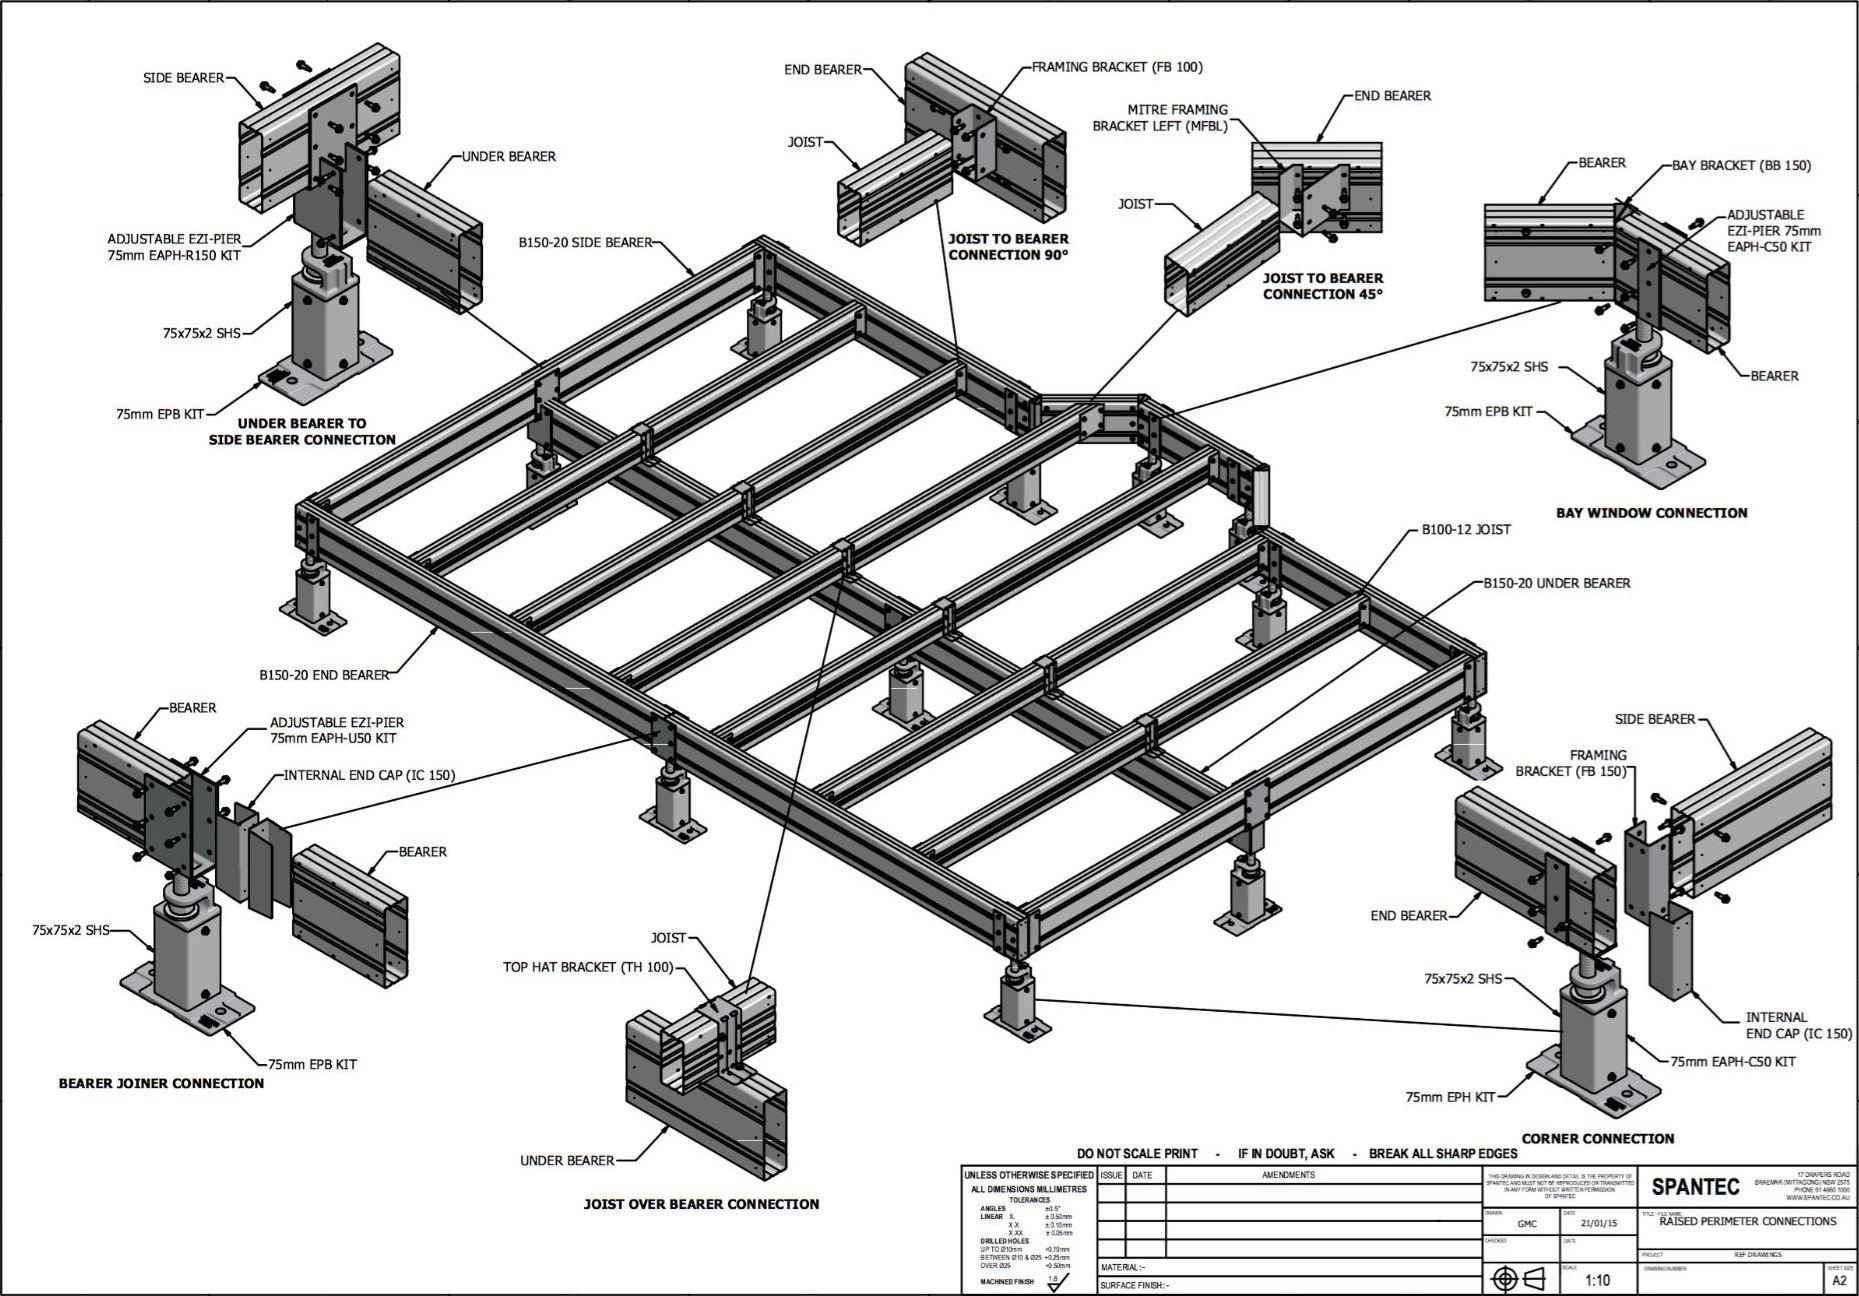 Illustration of standard floor connections in raised perimeter sub floor framing systems.